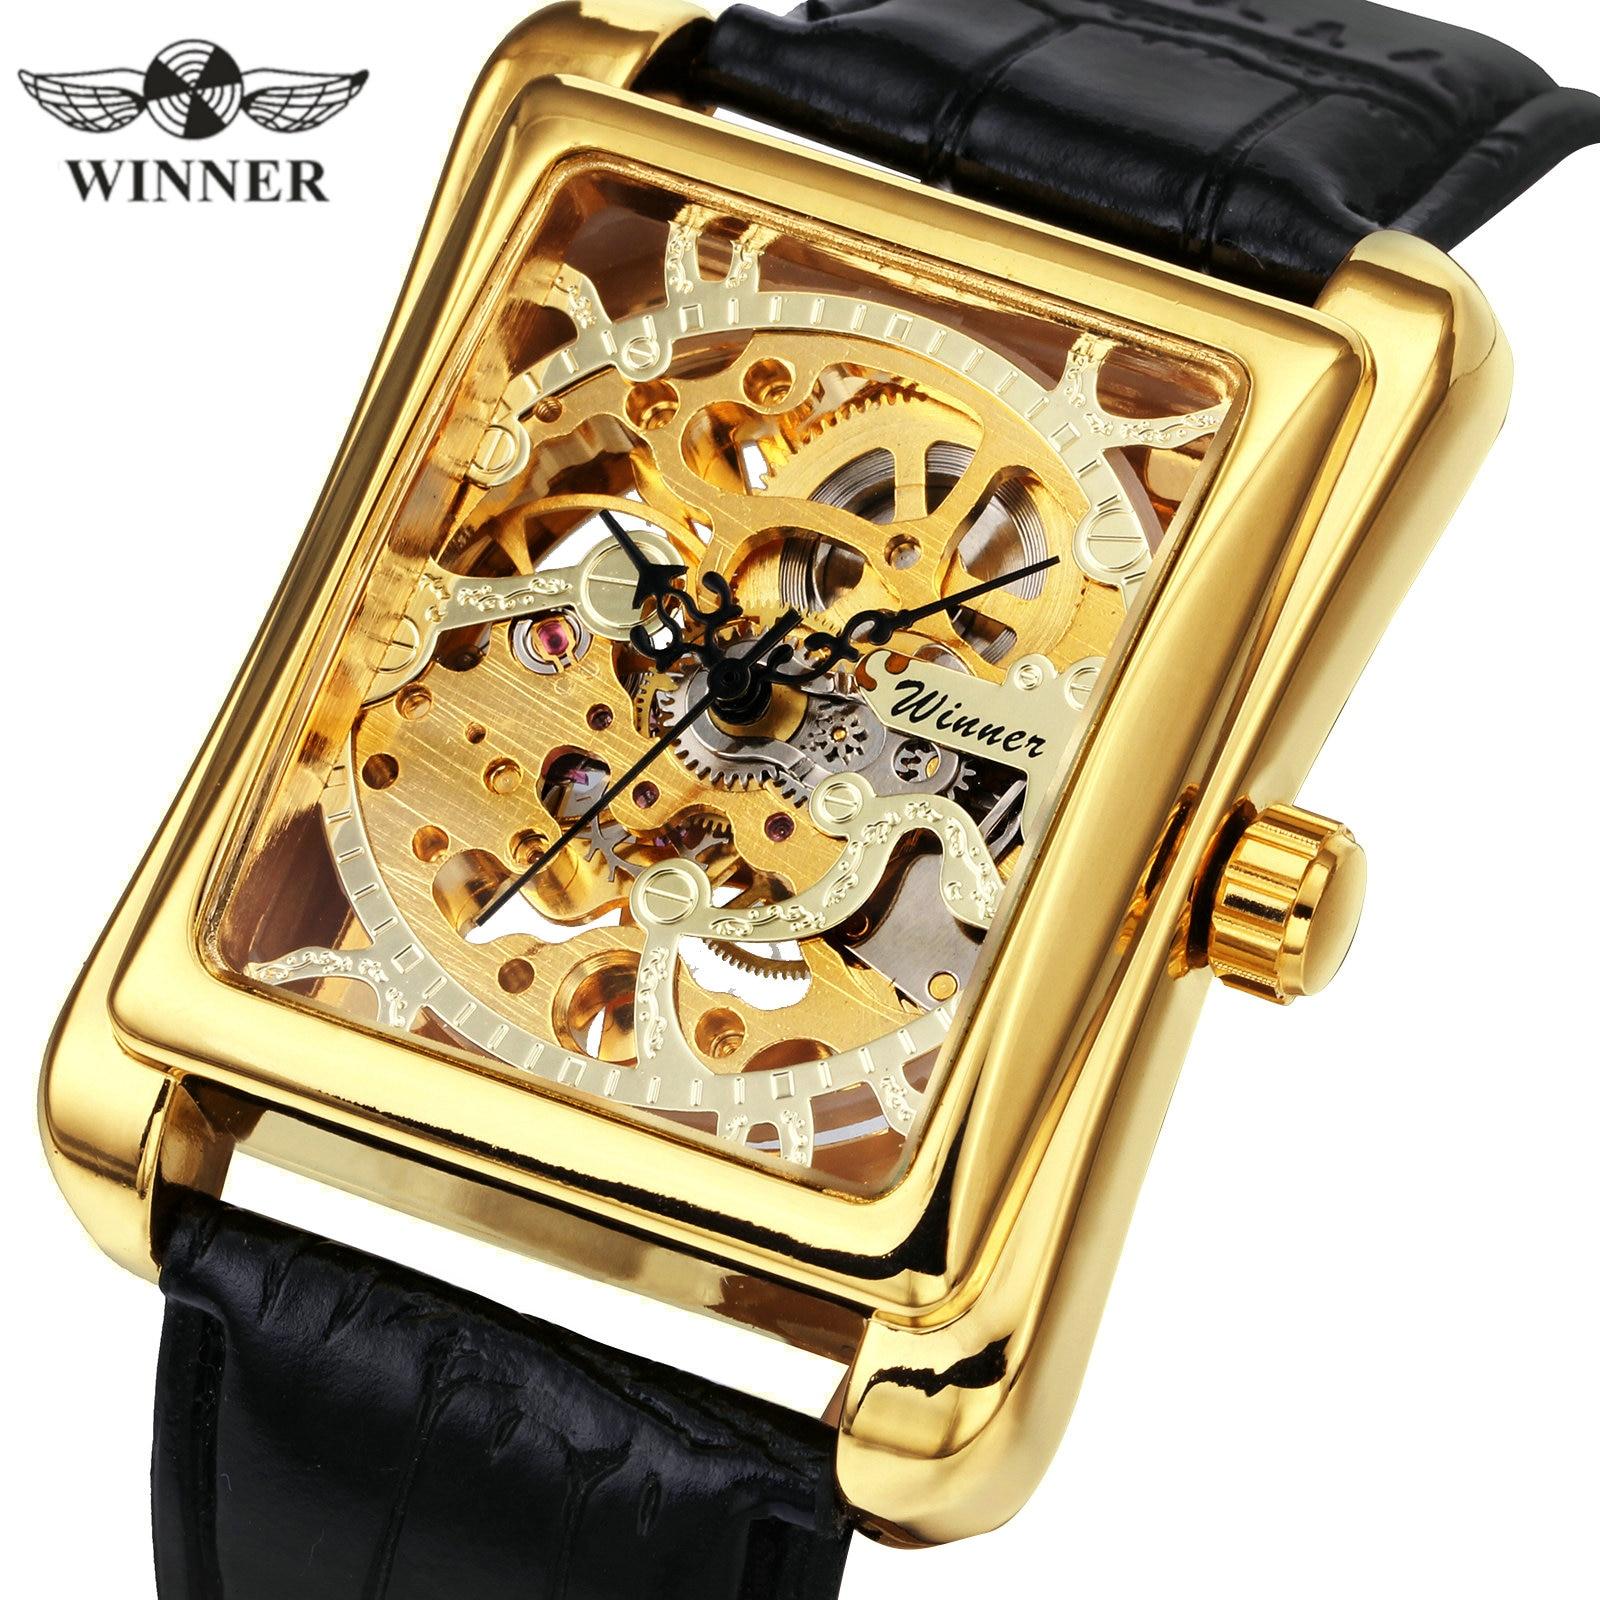 WINNER Official Elegant Women Watches Brand Luxury Mechanical Ladies Watch Leather Strap Golden Skeleton Retro Rectangle Clock